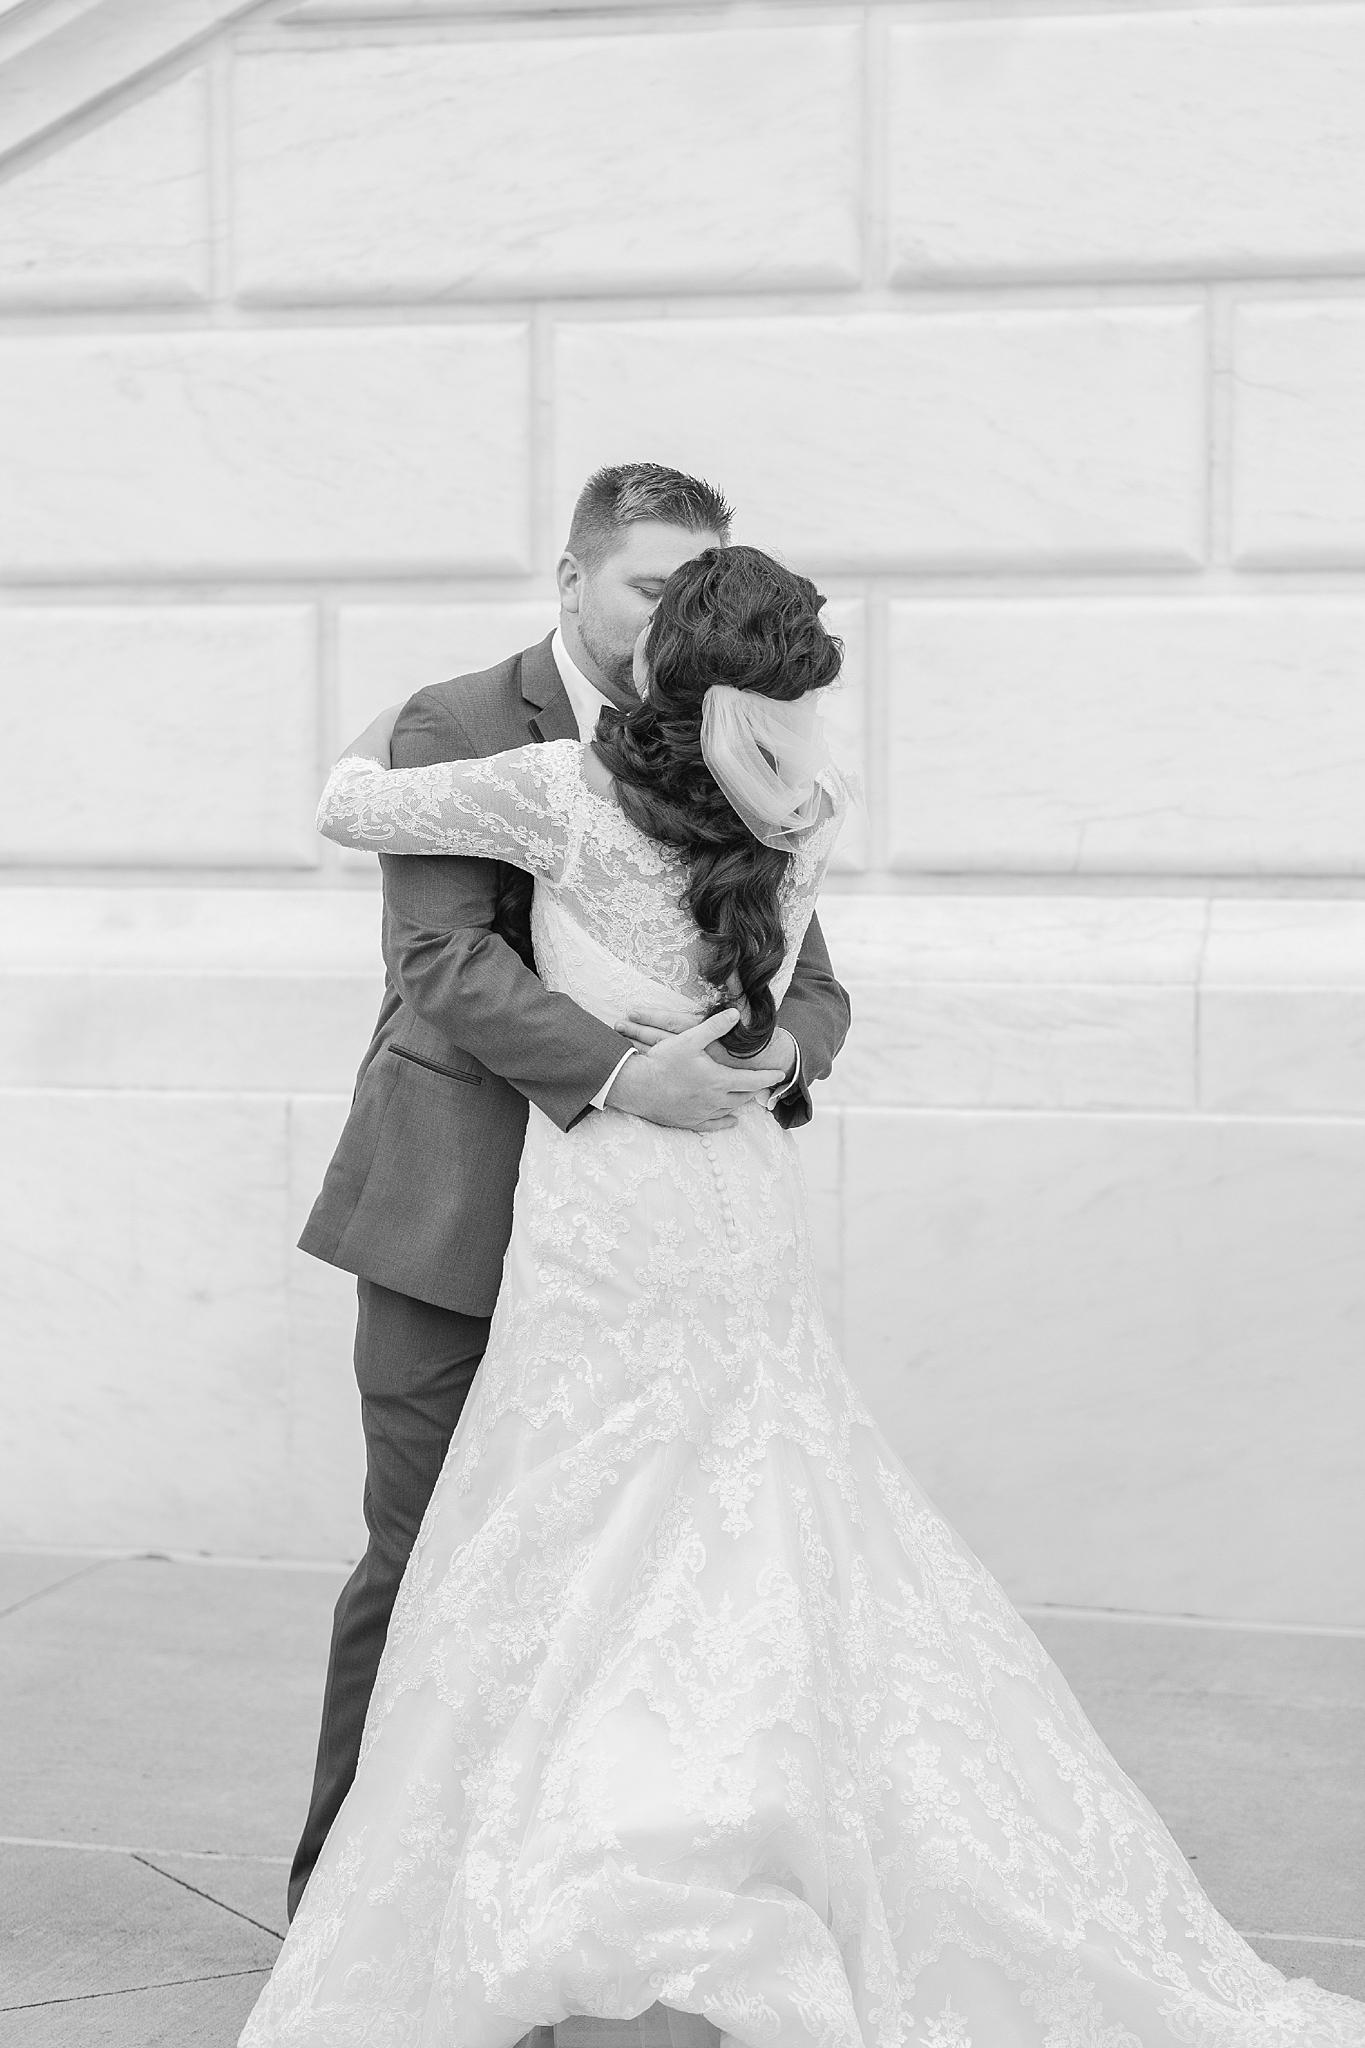 detroit-colony-club-wedding-regal-romantic-photography-in-detroit-mi-by-courtney-carolyn-photography_0011.jpg